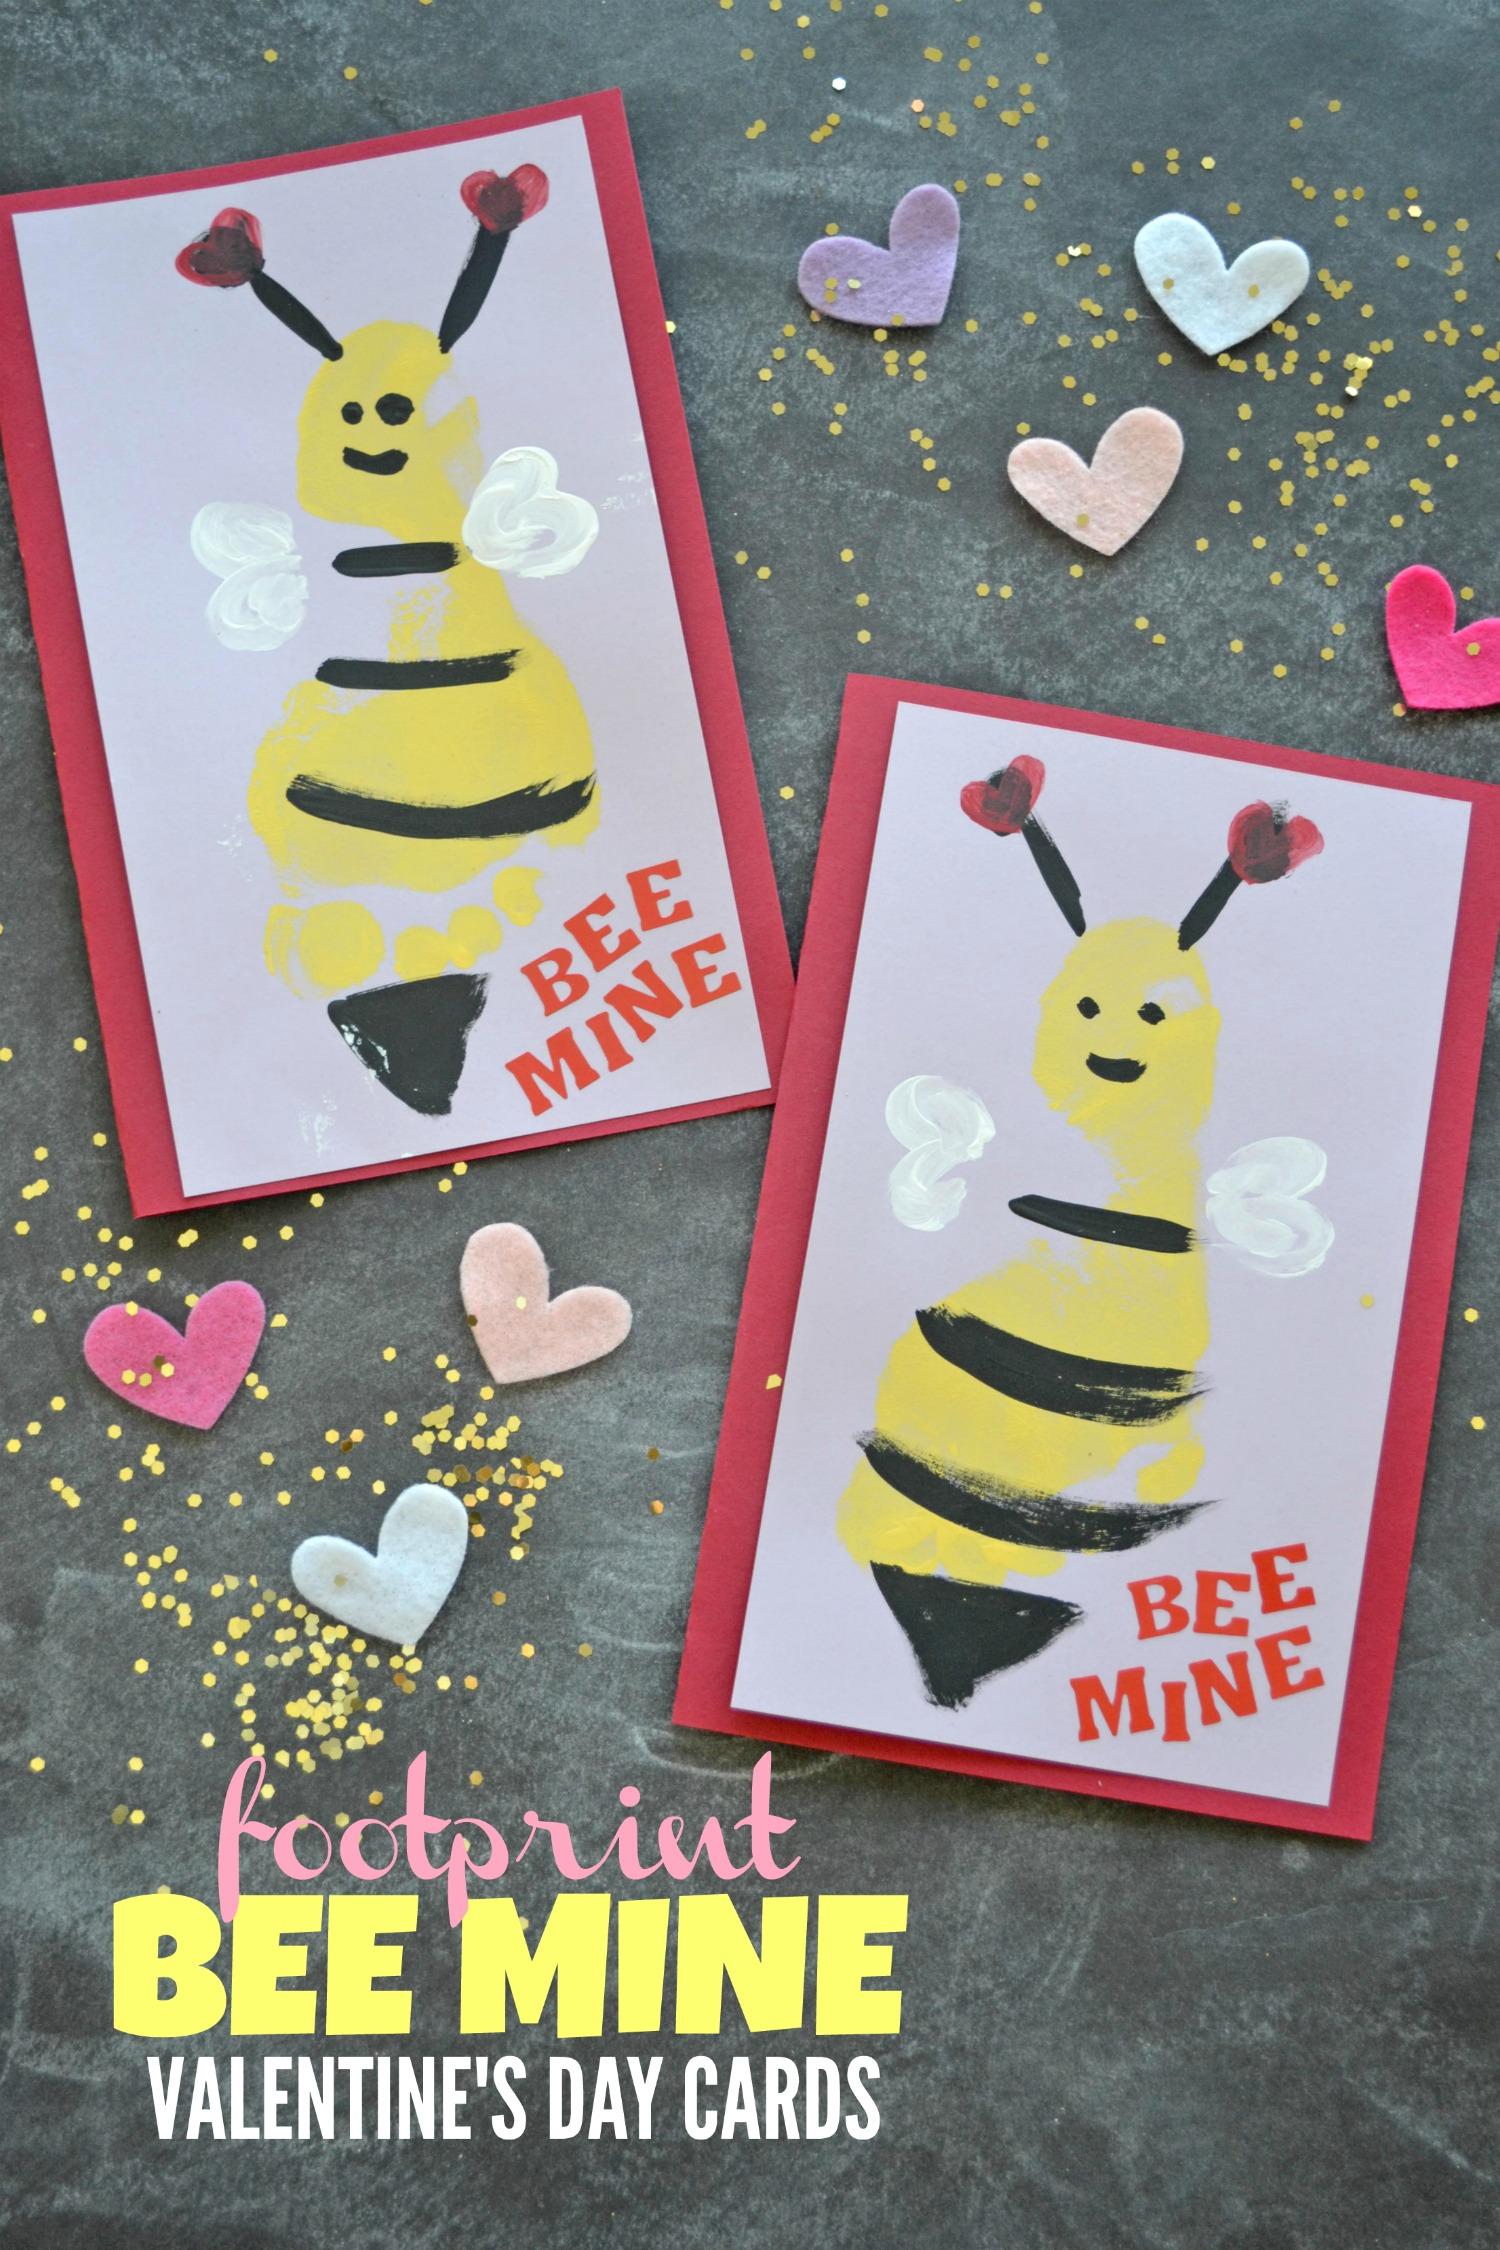 Footprint Bee Mine Valentines Day Cards – Bee Mine Valentine Card